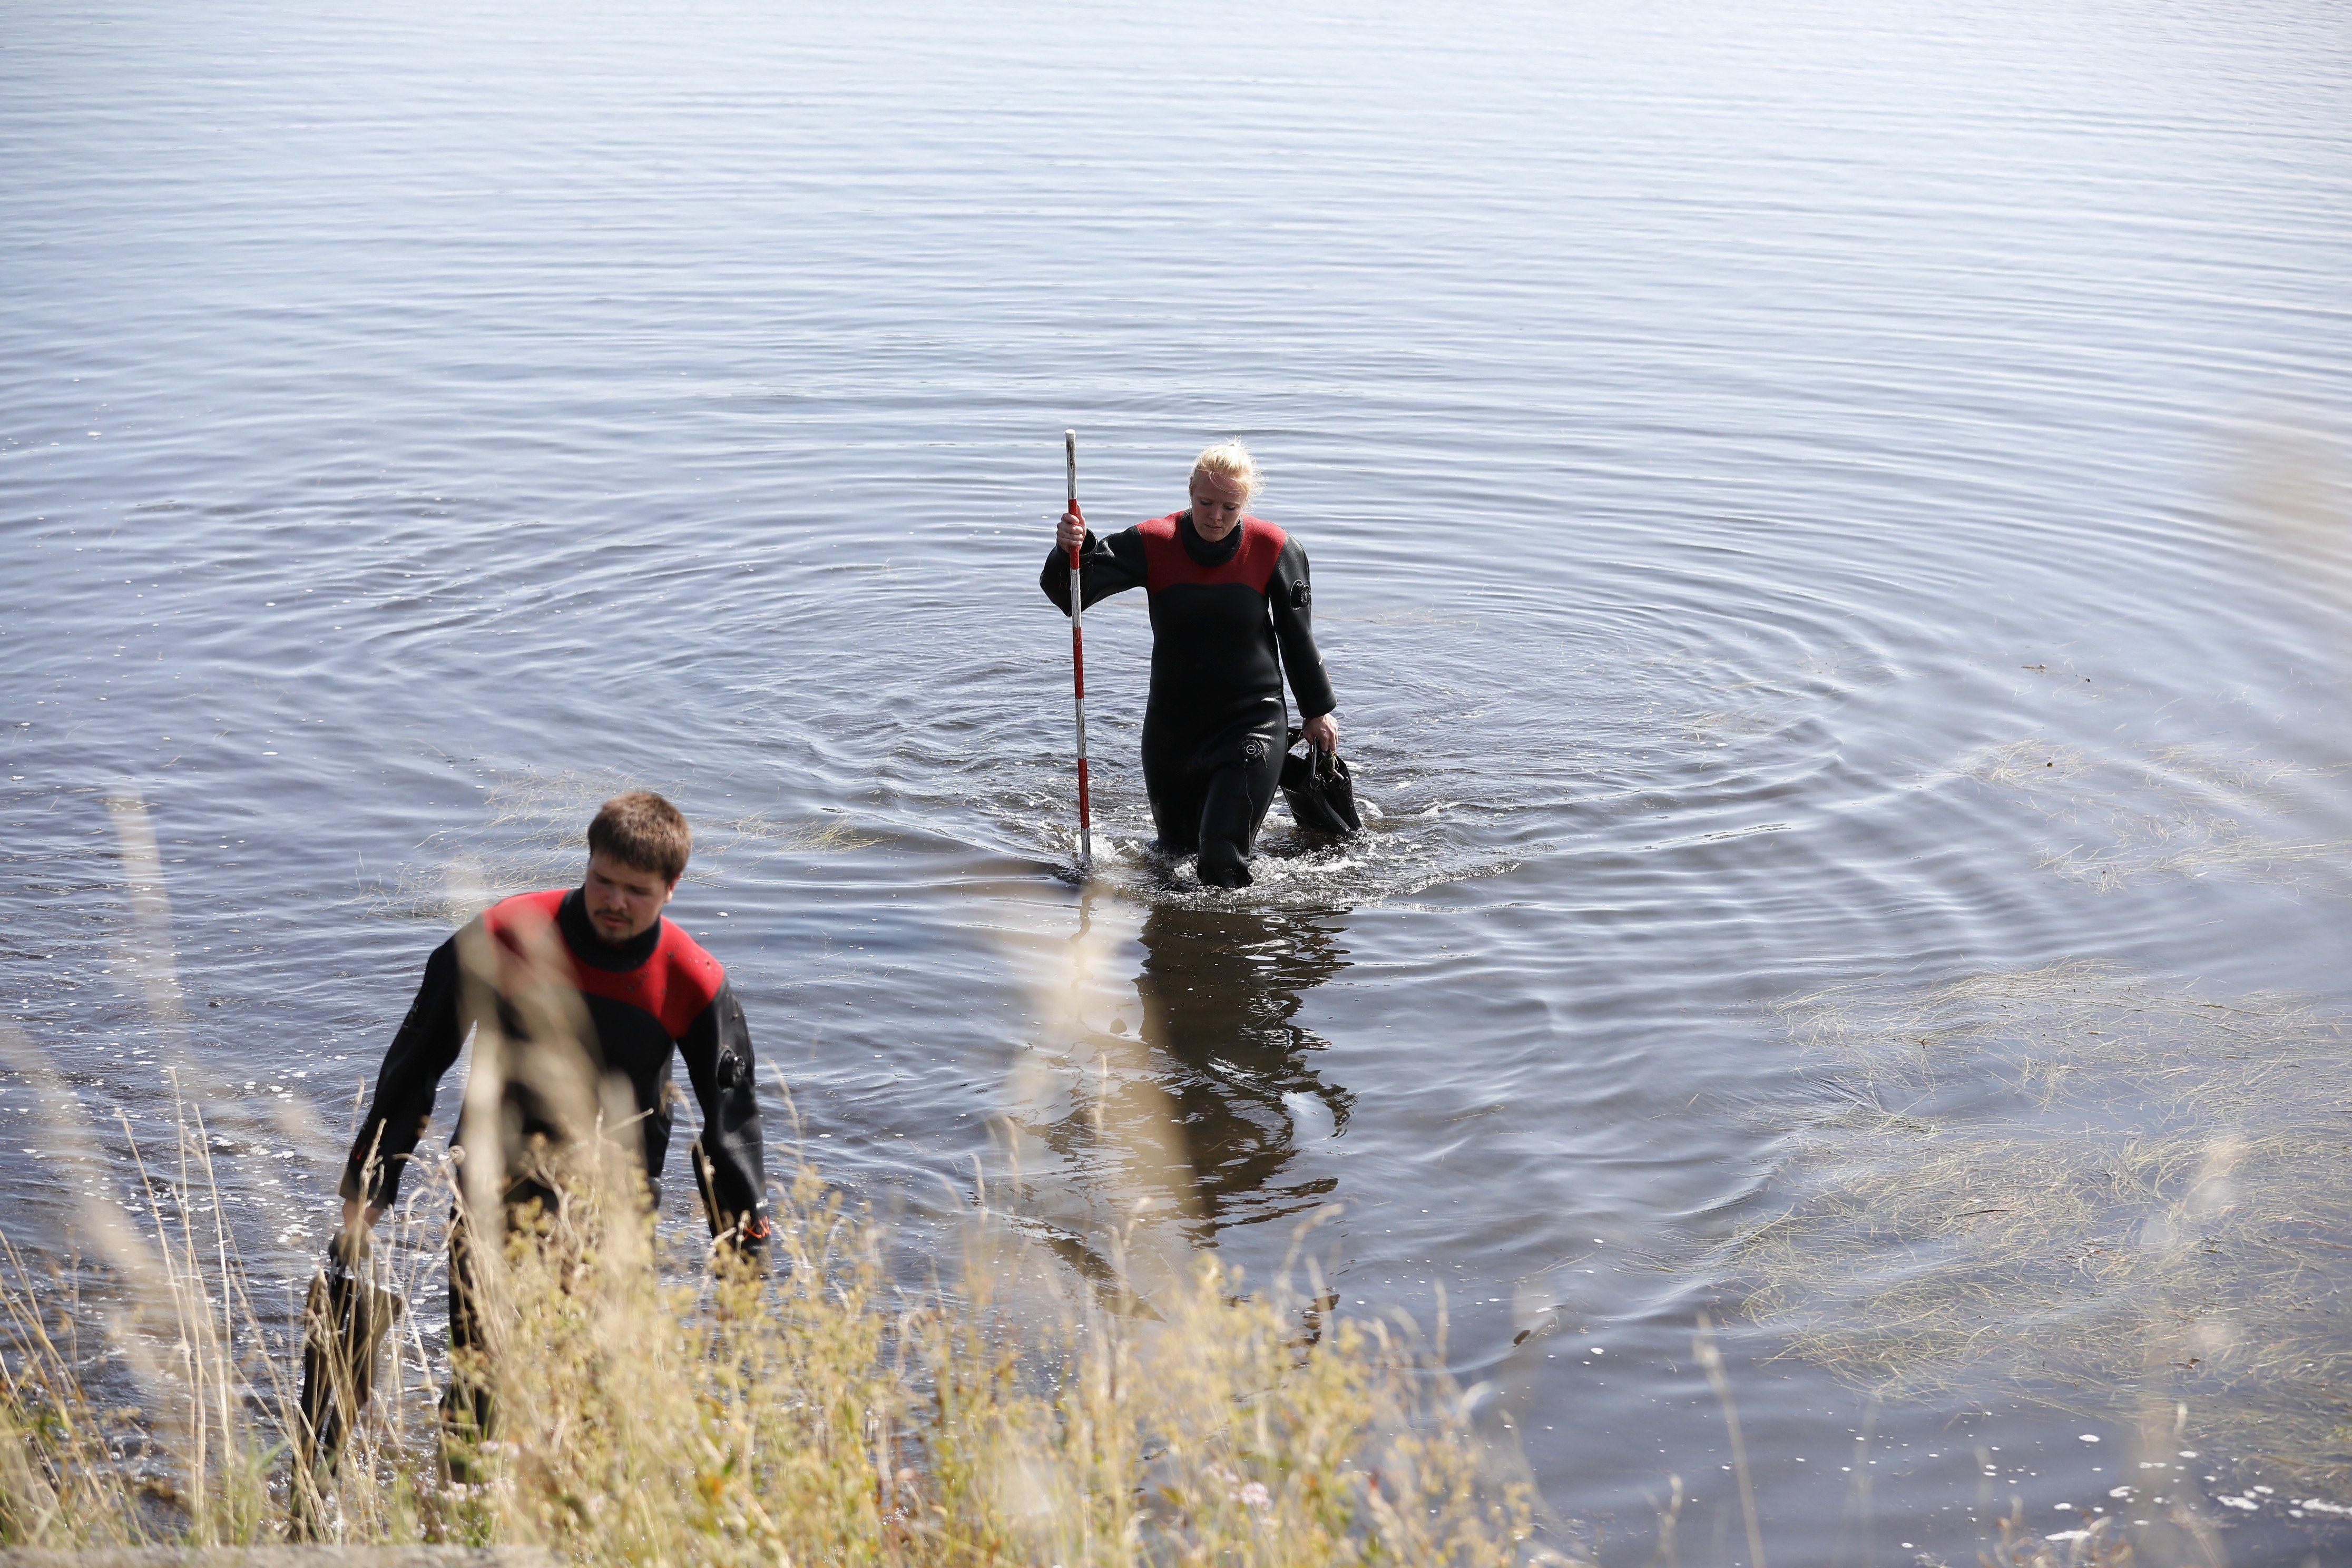 journalist kim wall s head found in sea near copenhagen on kim wall id=73500